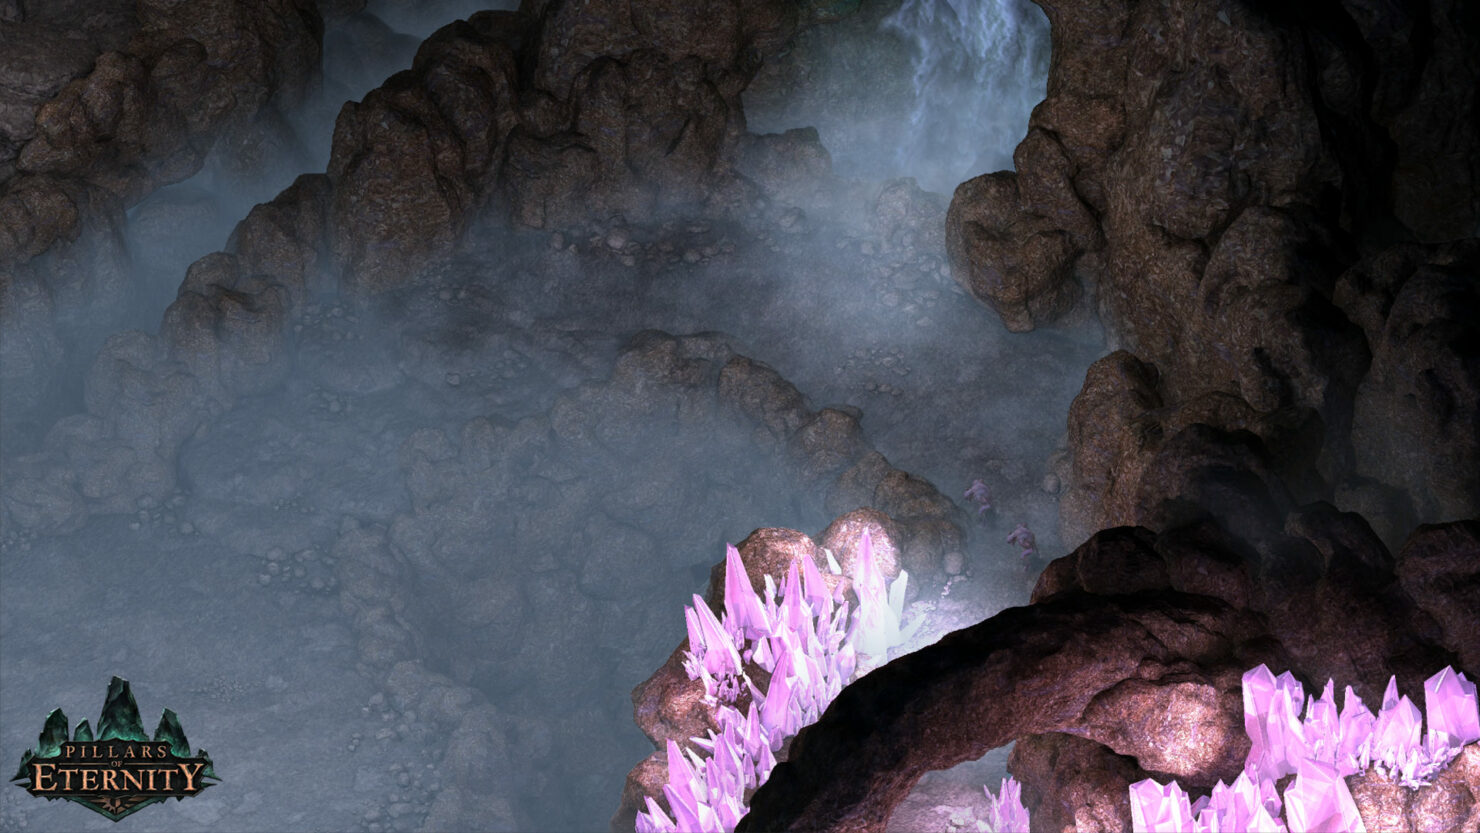 pillars-of-eternity-6